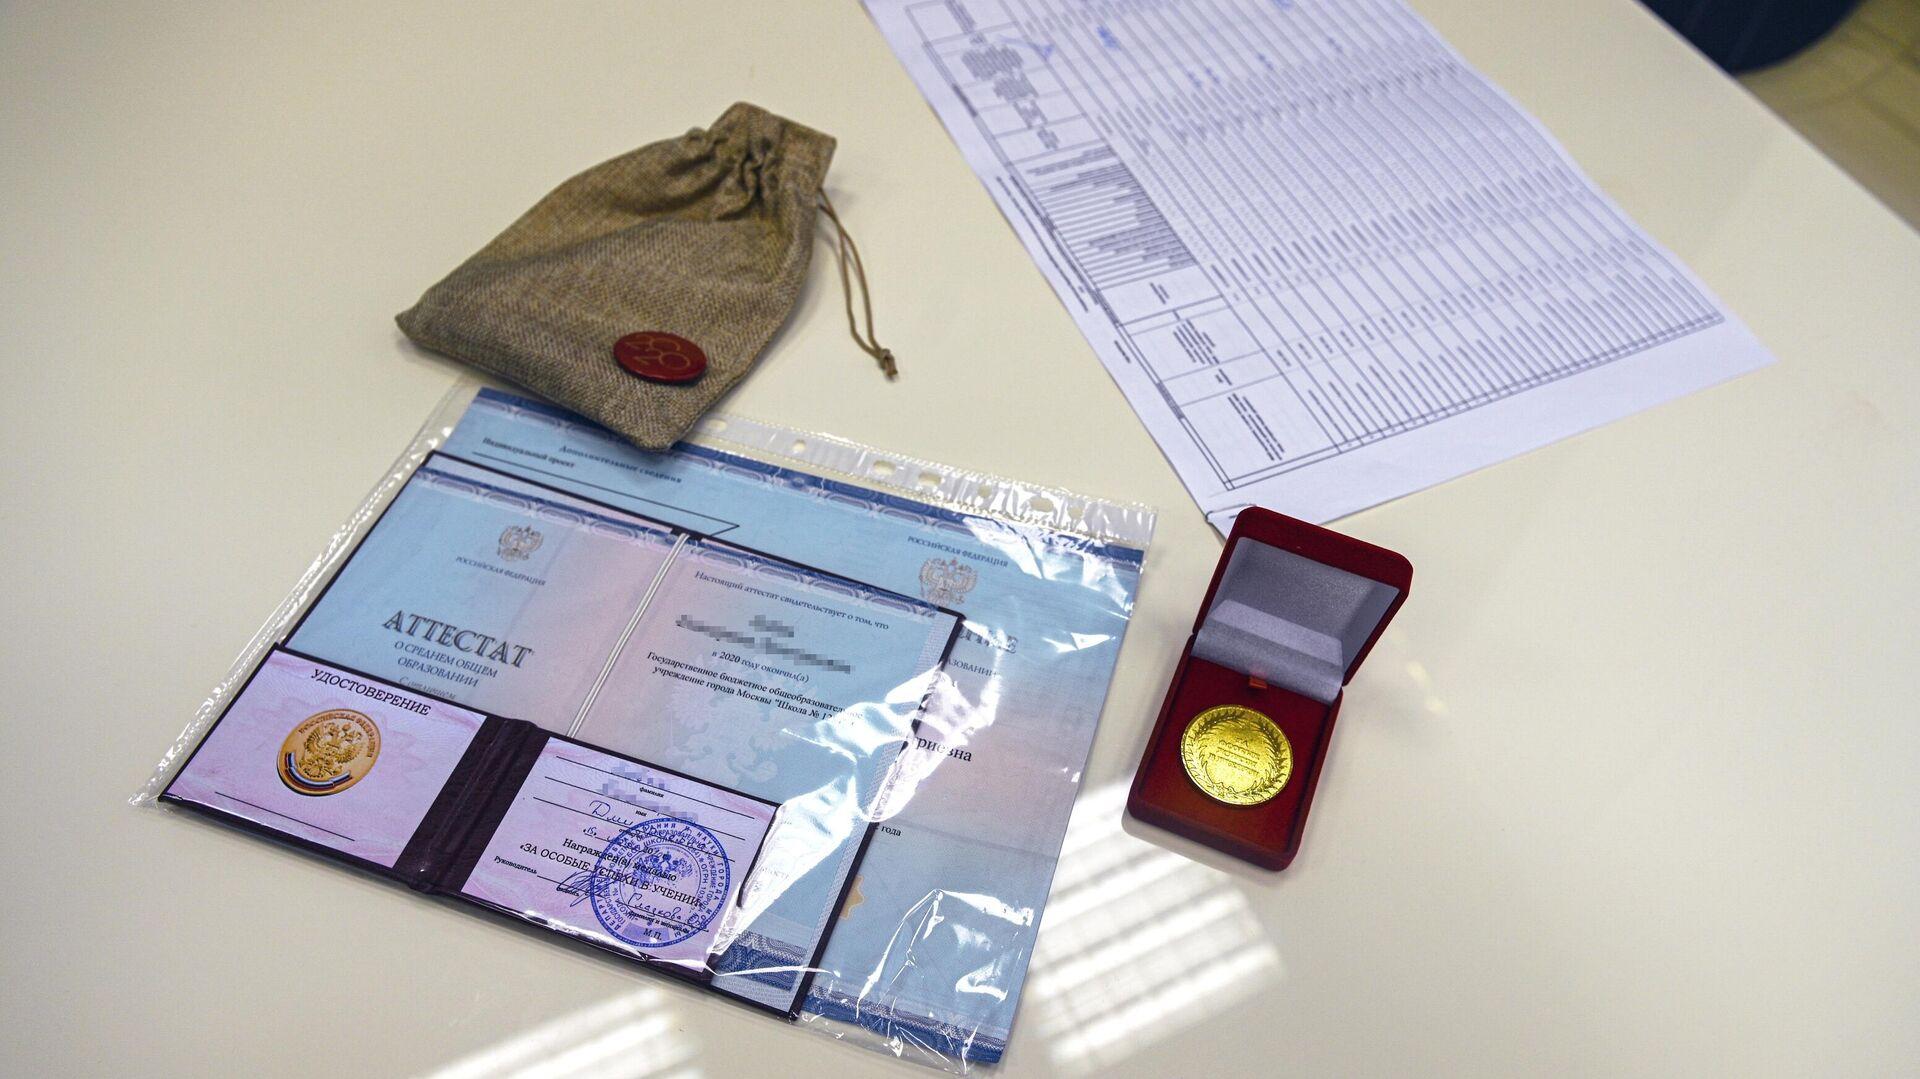 Аттестат и медаль на церемонии вручения аттестатов в школе - РИА Новости, 1920, 17.06.2021